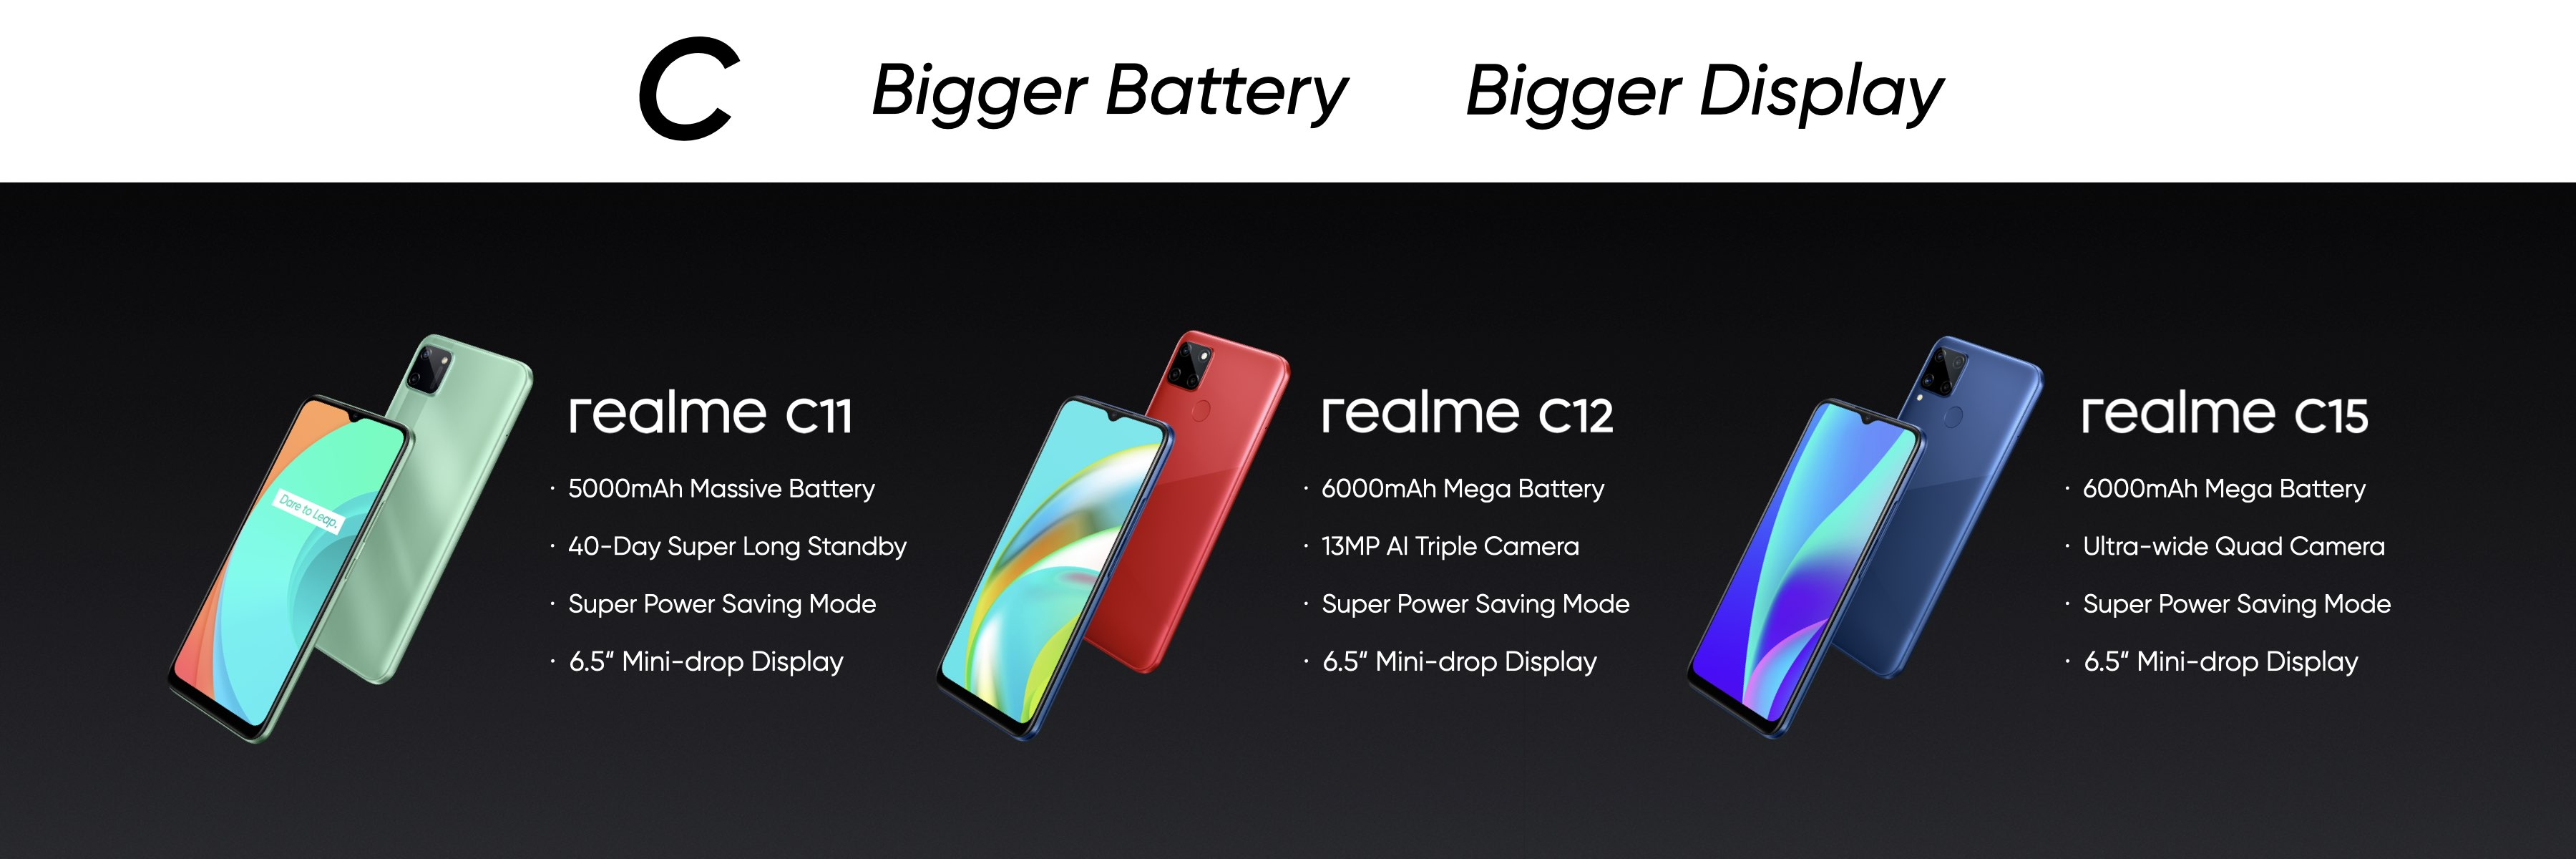 01_【4G產品線】realme C系列,主打大螢幕大電池。